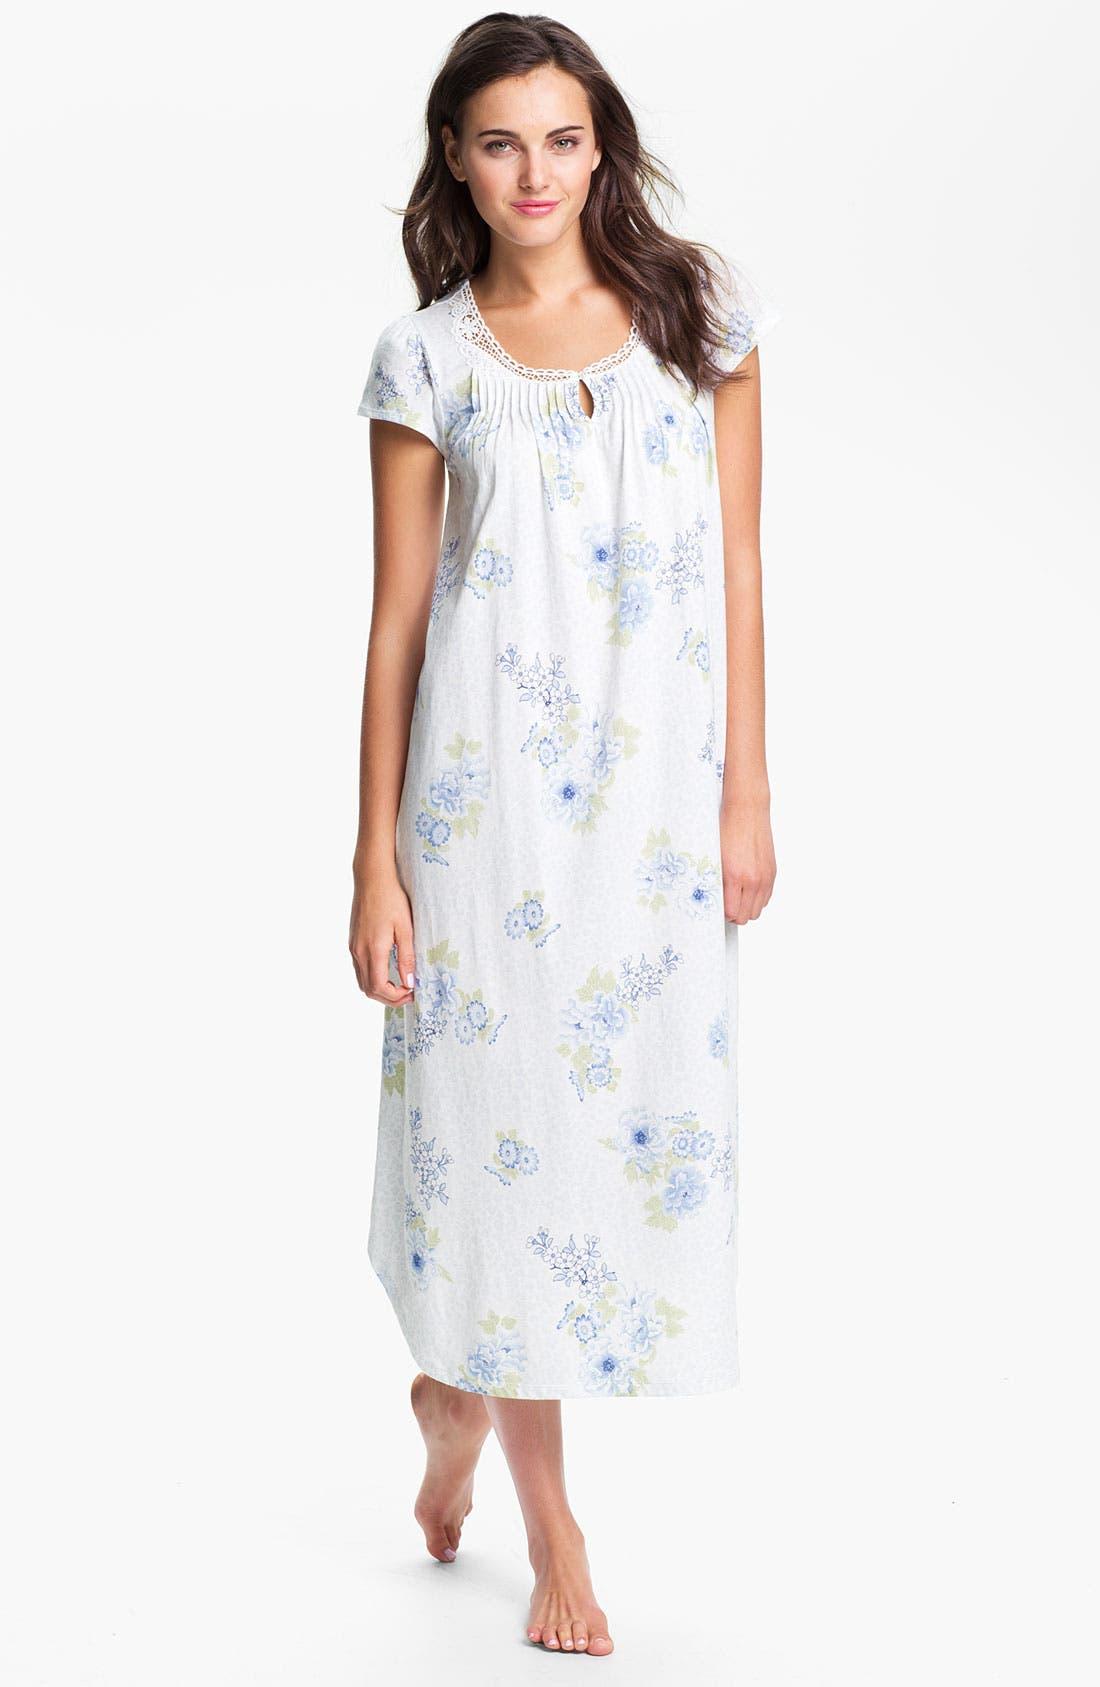 Main Image - Carole Hochman Designs Cotton Jersey Nightgown